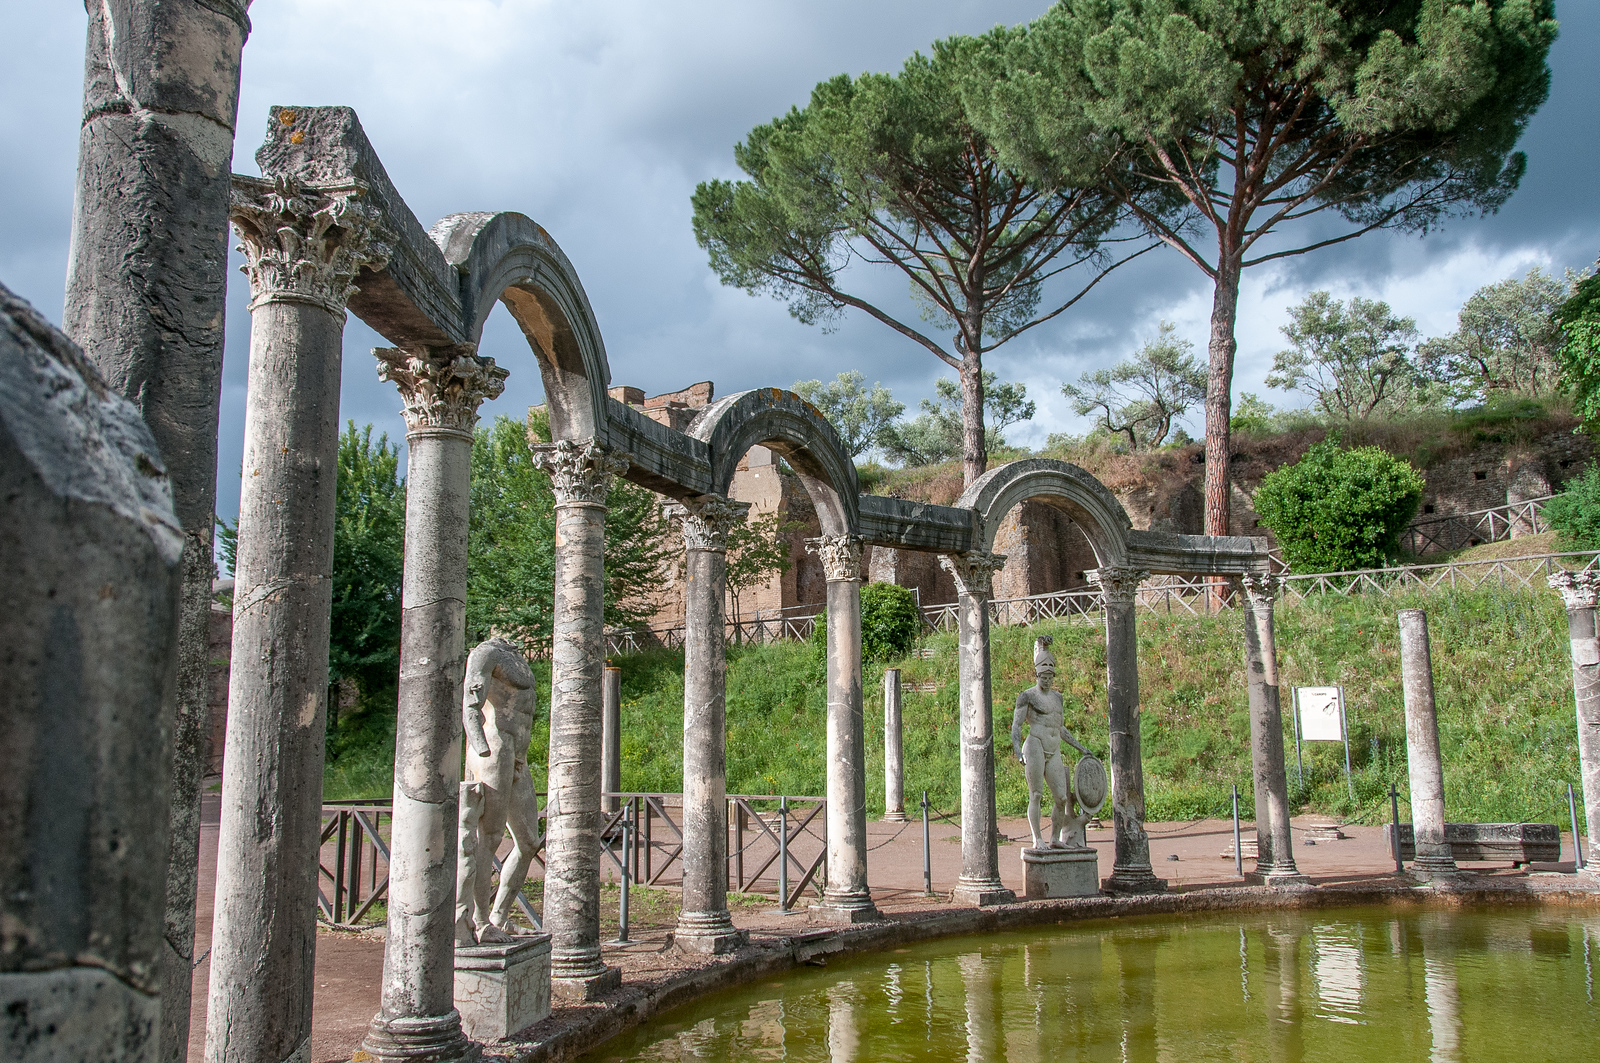 Villa Adriana (Tivoli) - UNESCO World Heritage Site